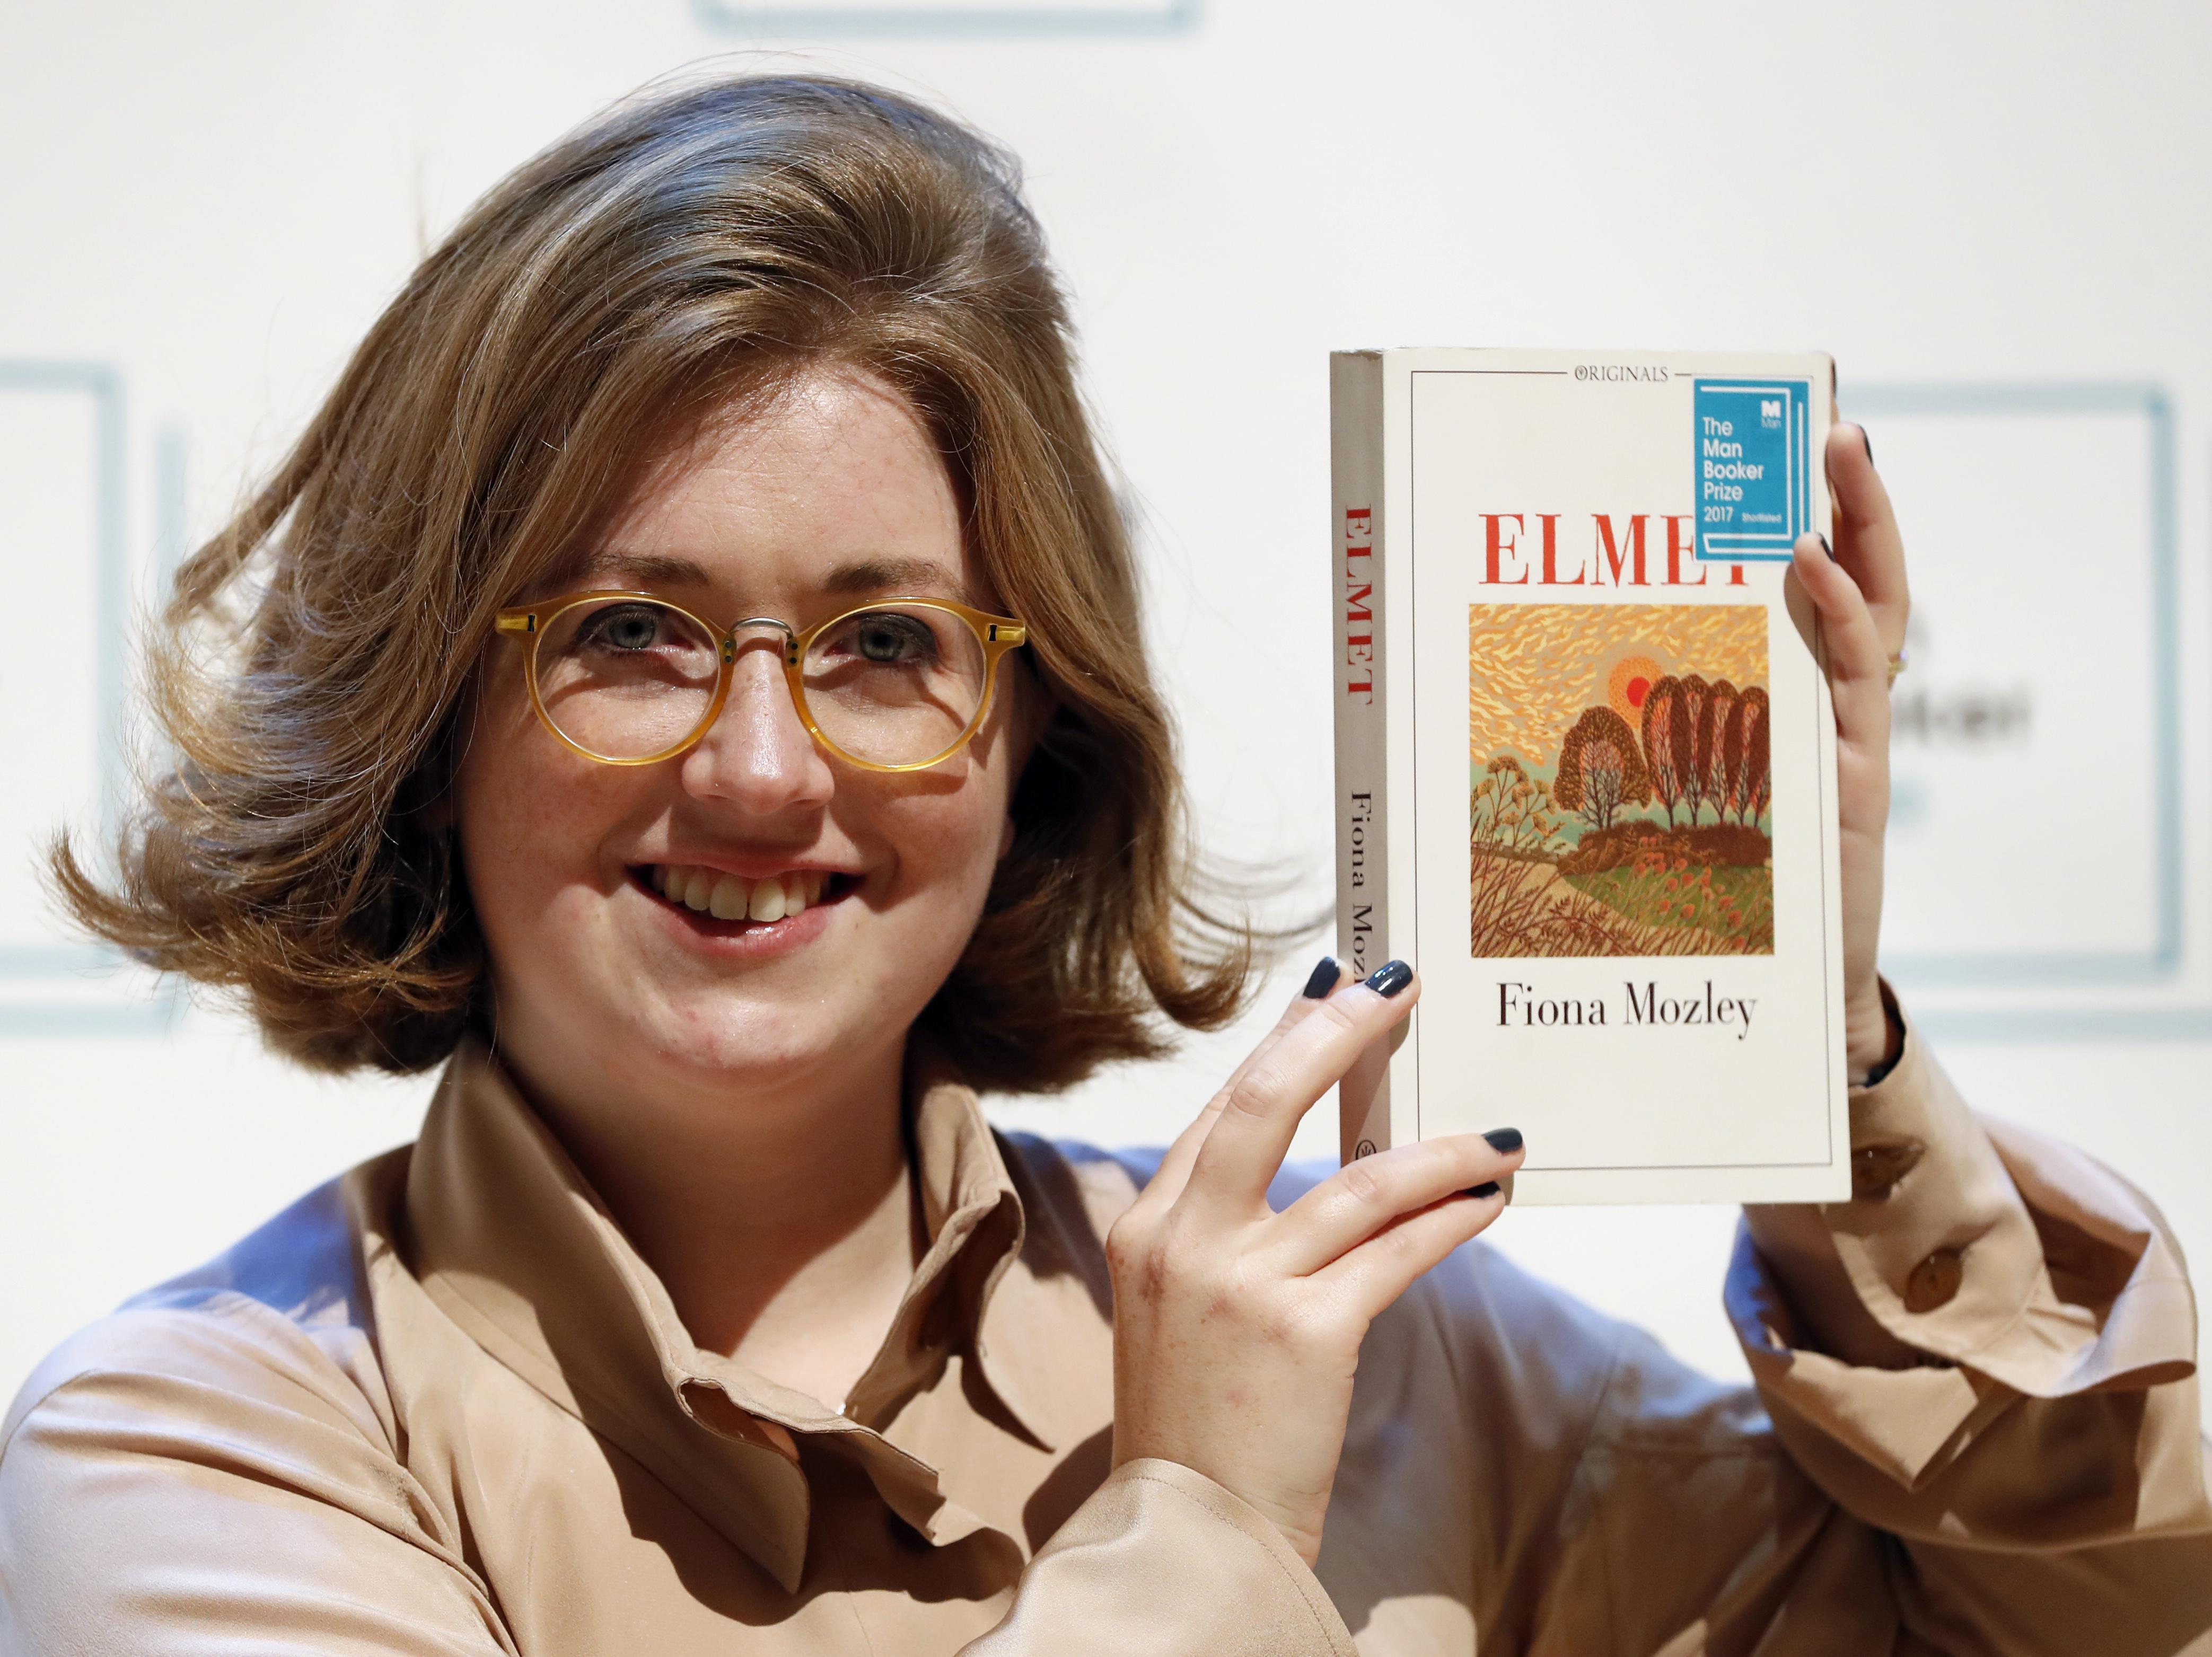 Debut Author Channeled Her 'Darker Bits' Into A Man Booker Shortlist Novel